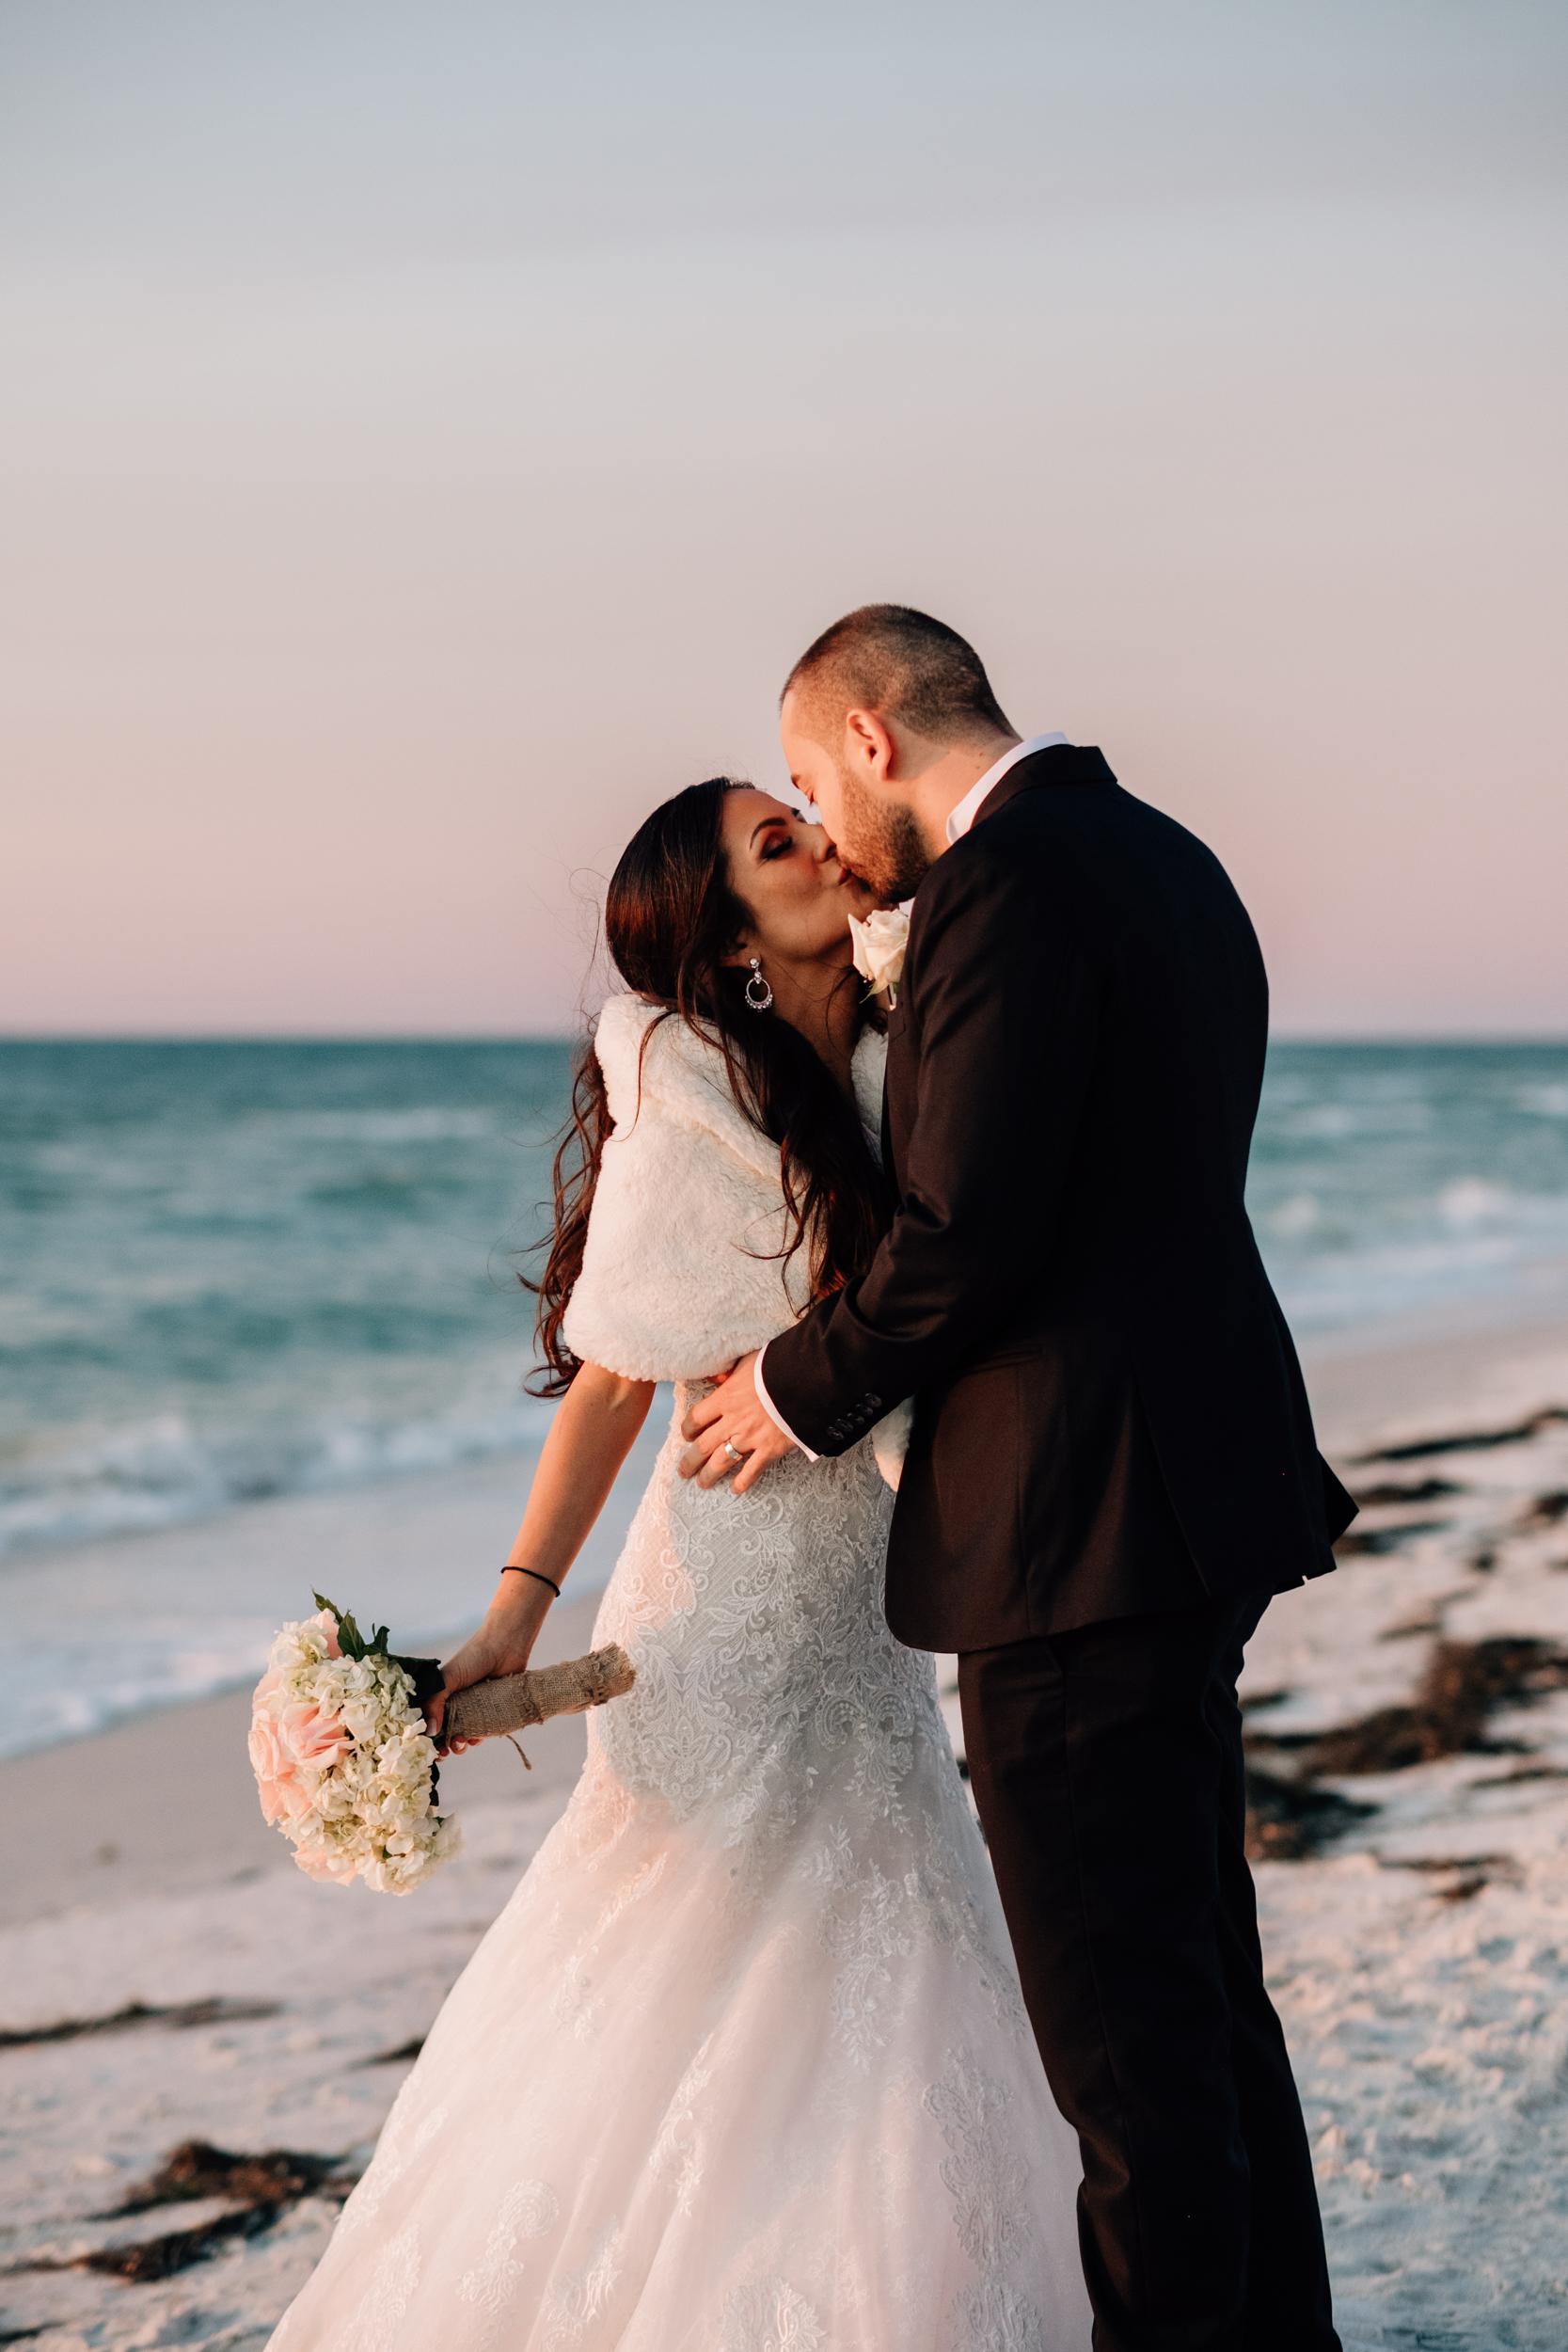 Amethyst Weddings - Georgi and Mariana 091.jpg